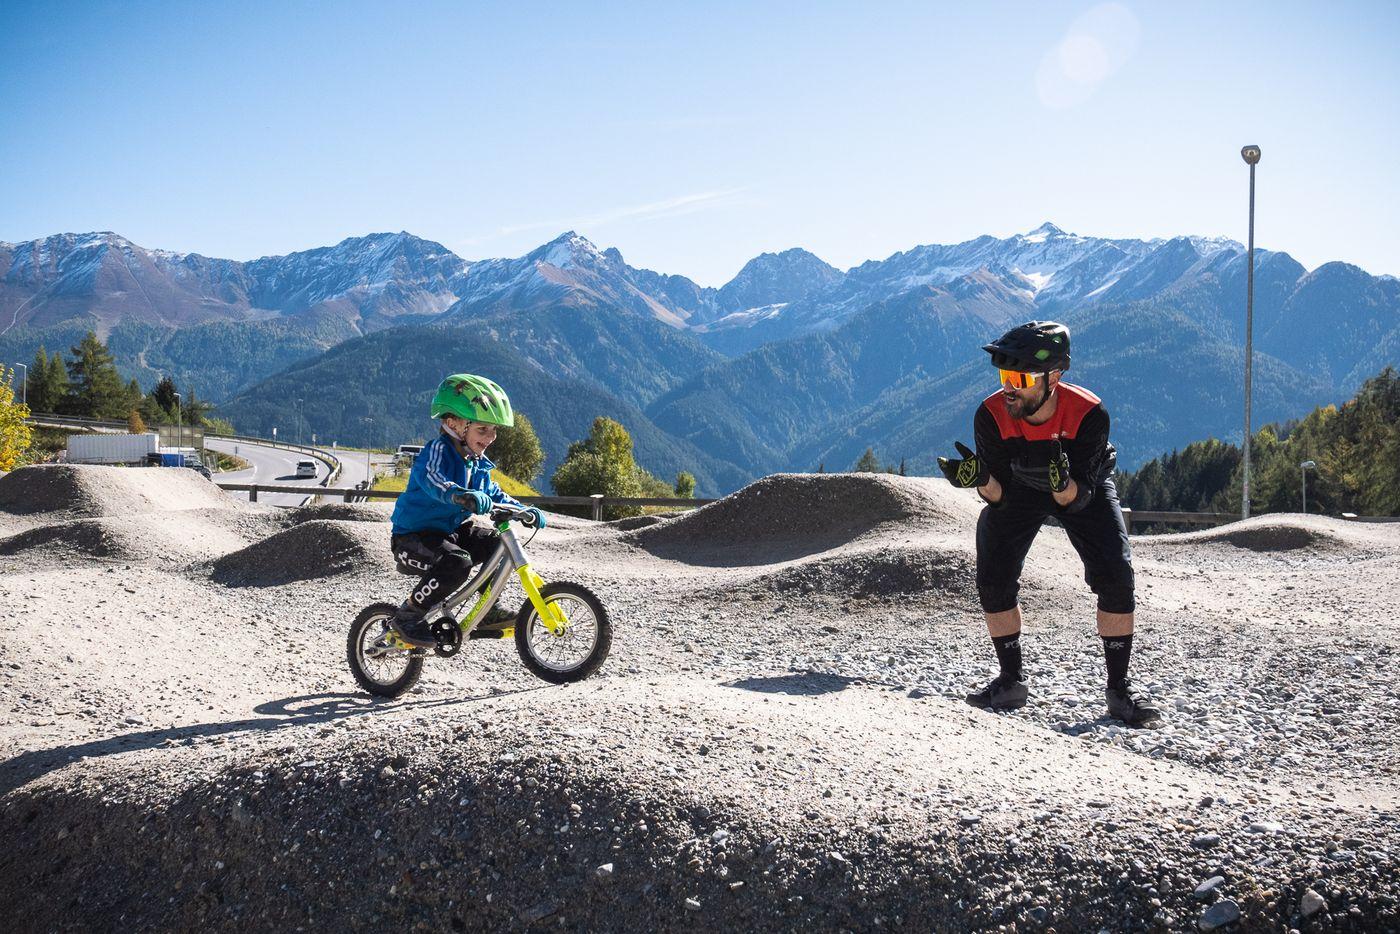 BORN-BikeparkSFL-Familientag-2019-BAUSE-Web-029